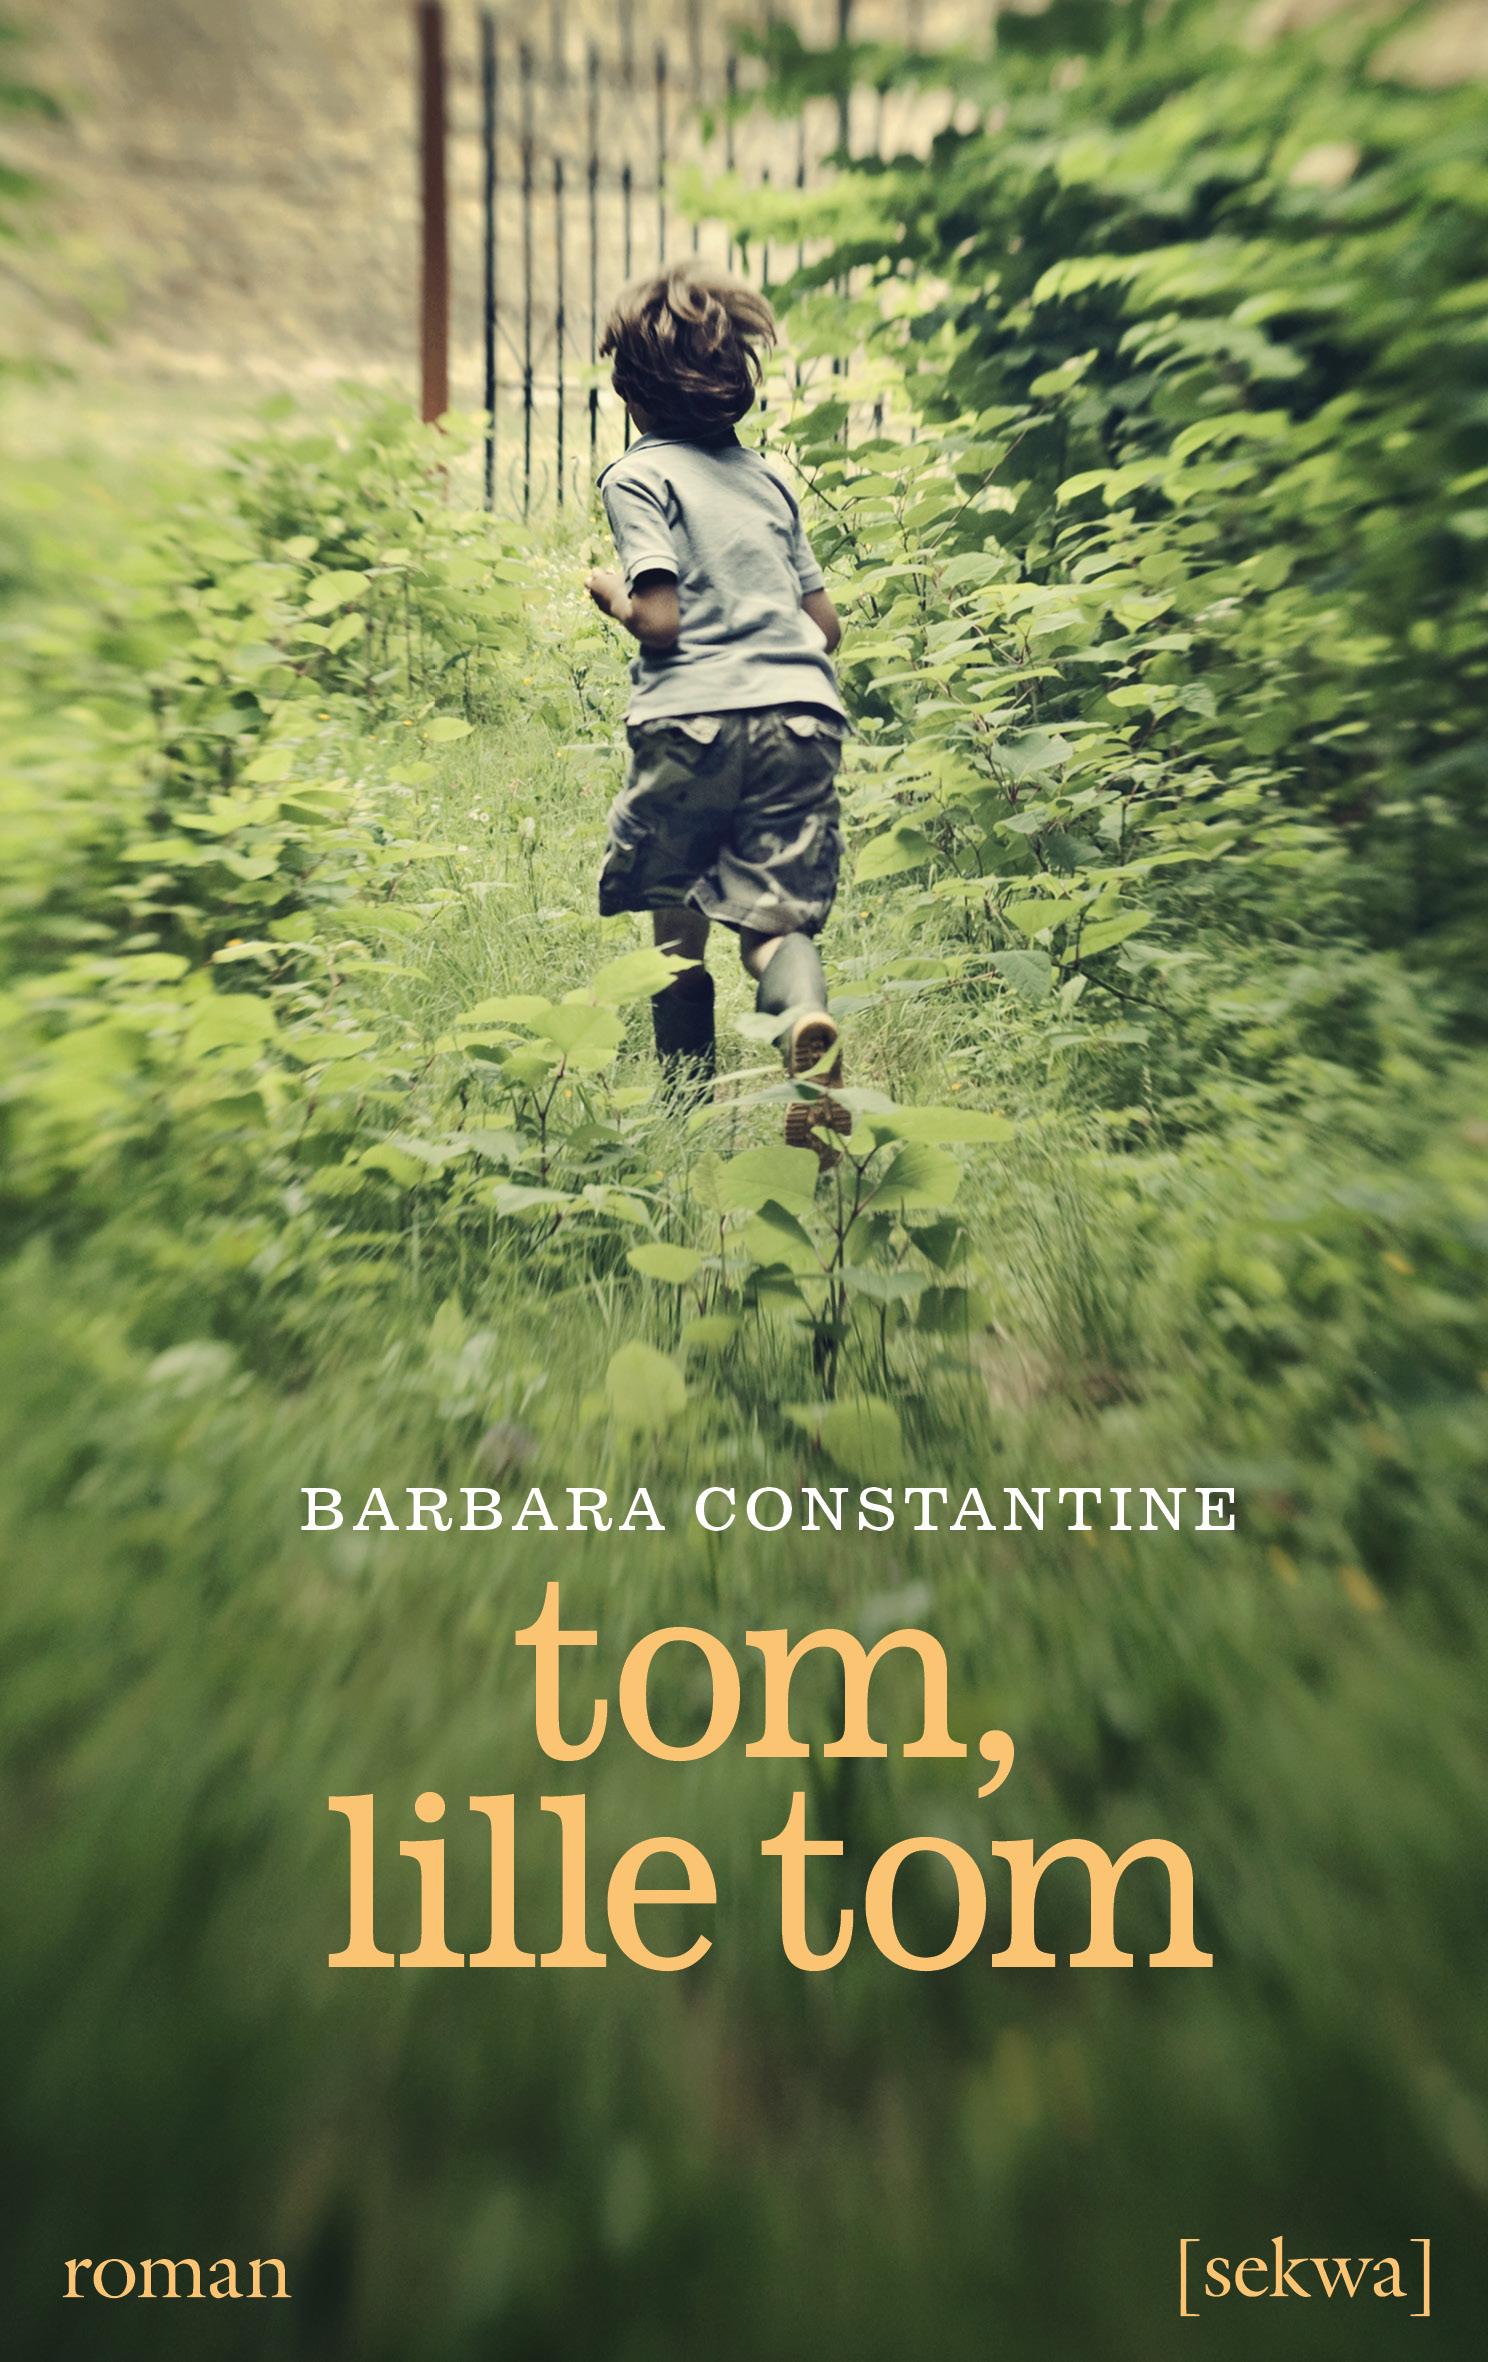 Barbara Constantine: Tom, lille Tom